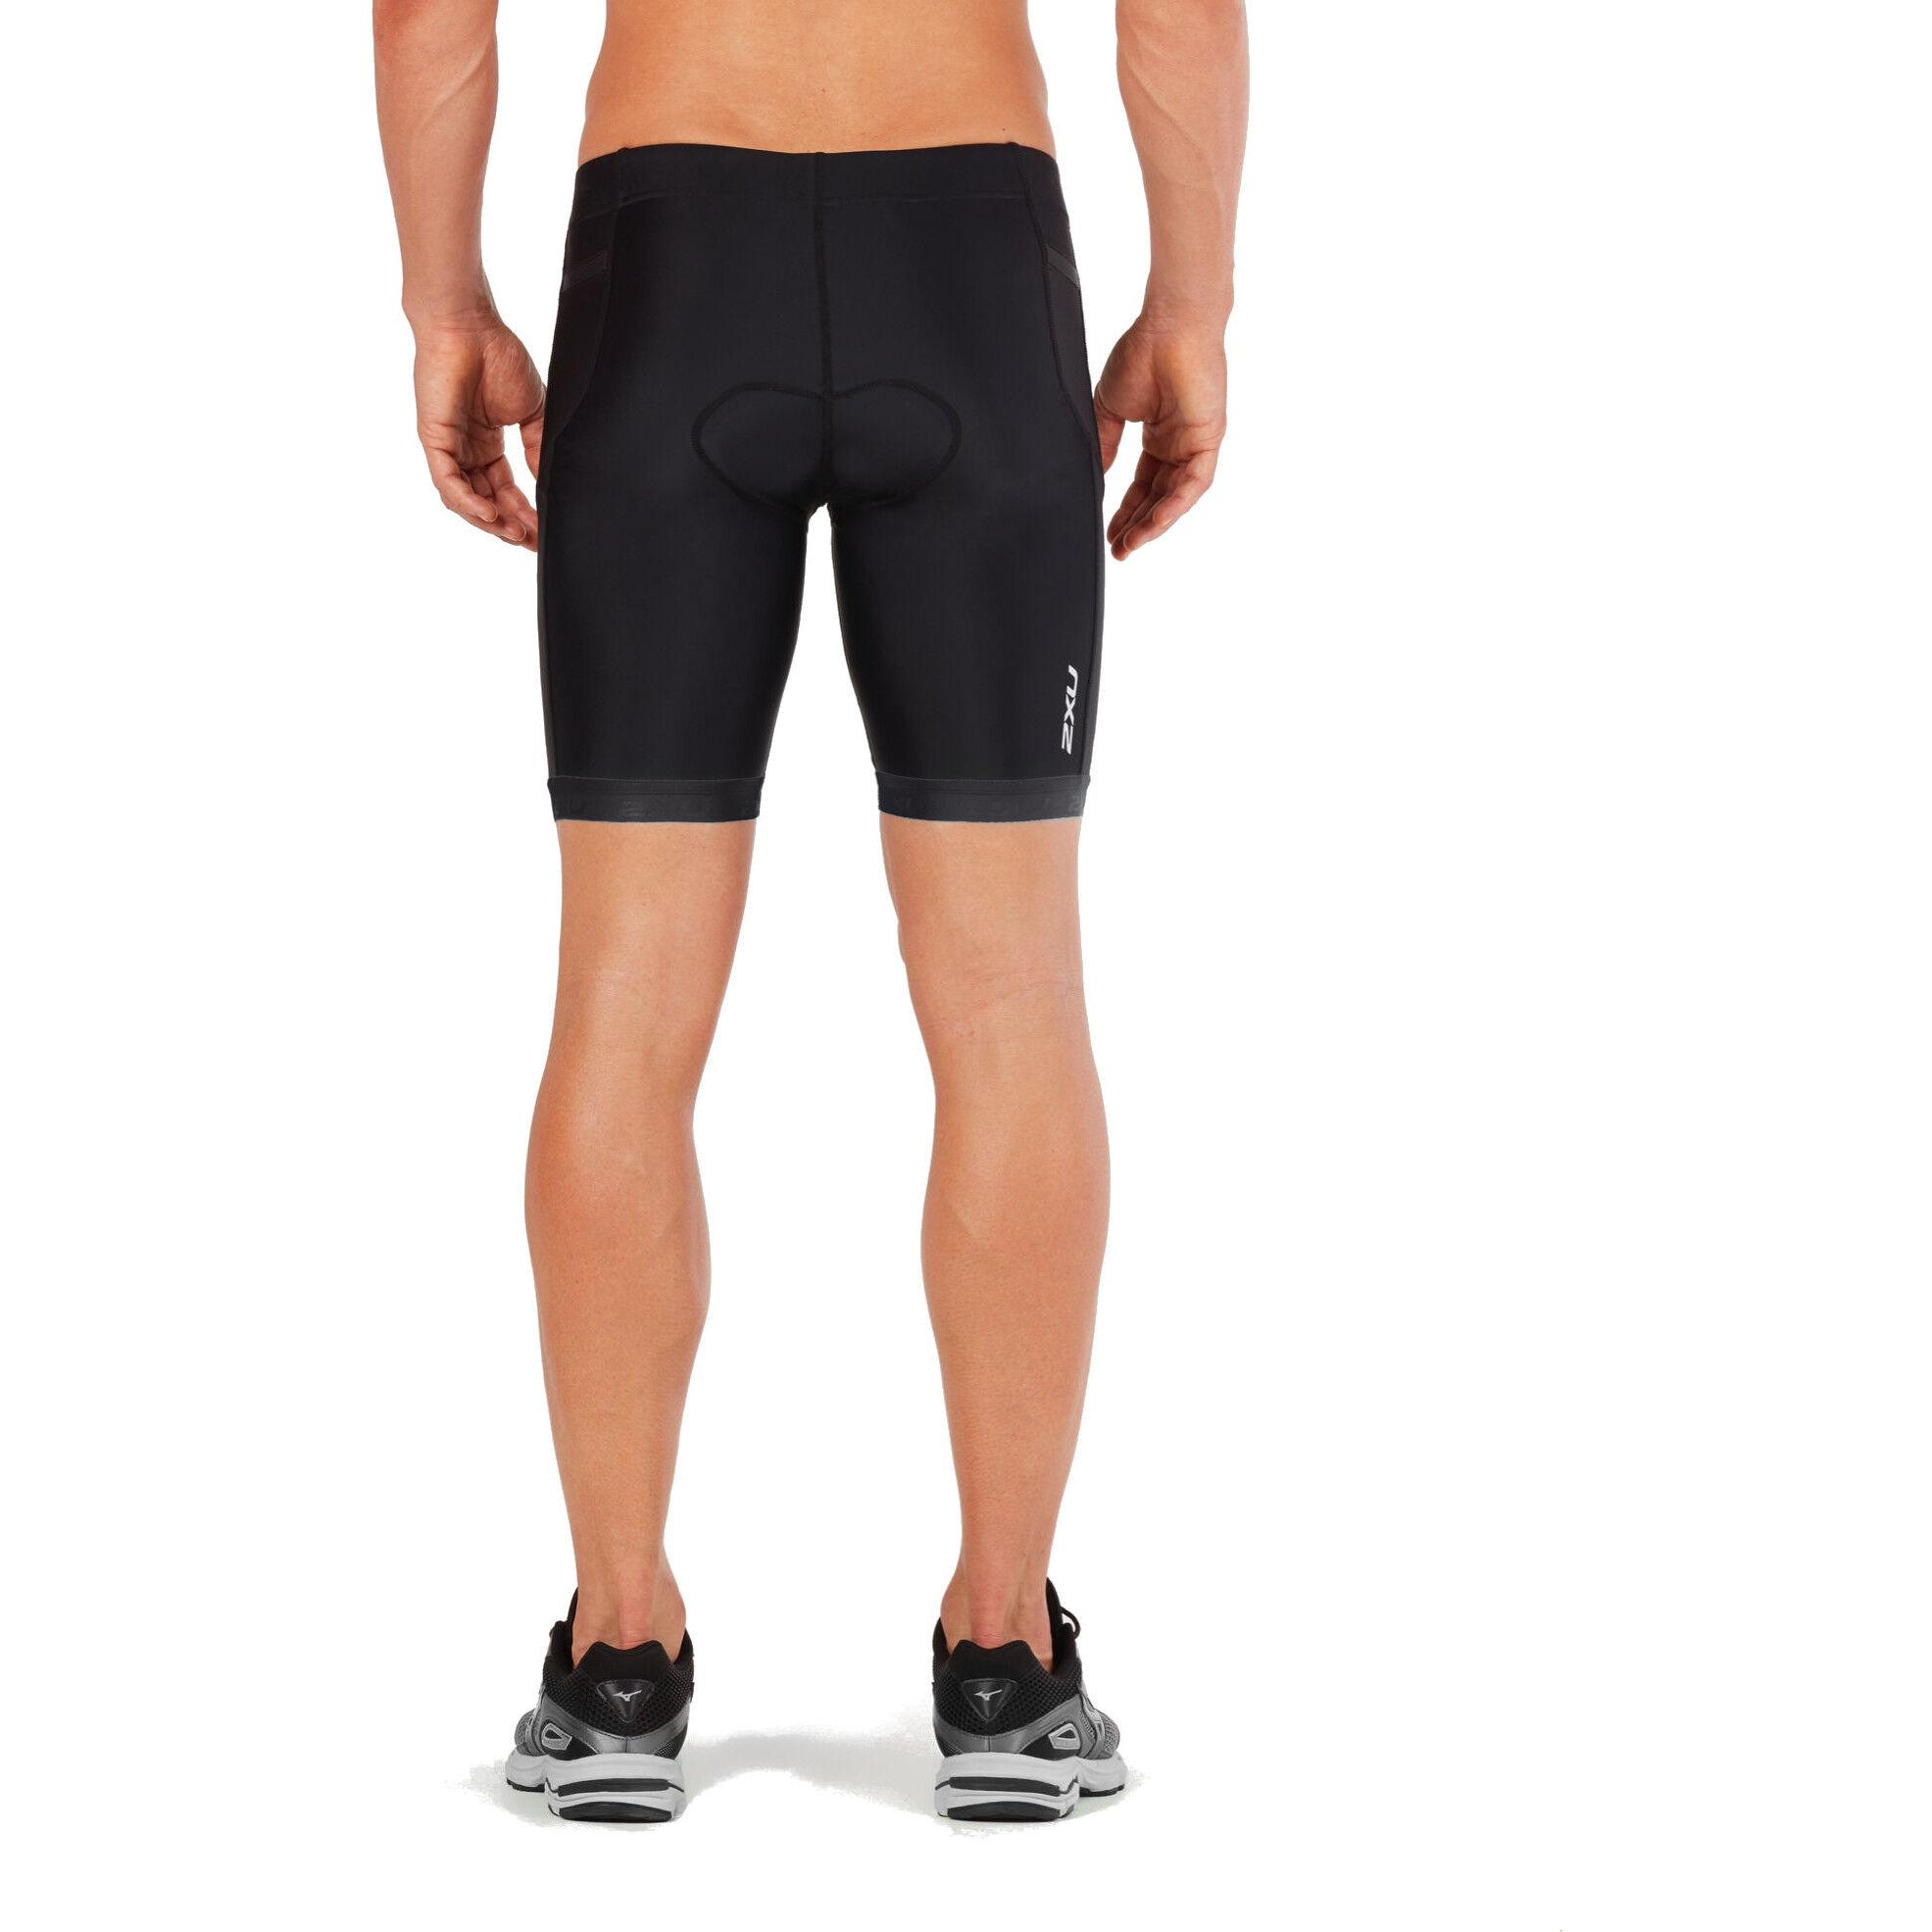 Black 2XU Active Mens Tri Shorts